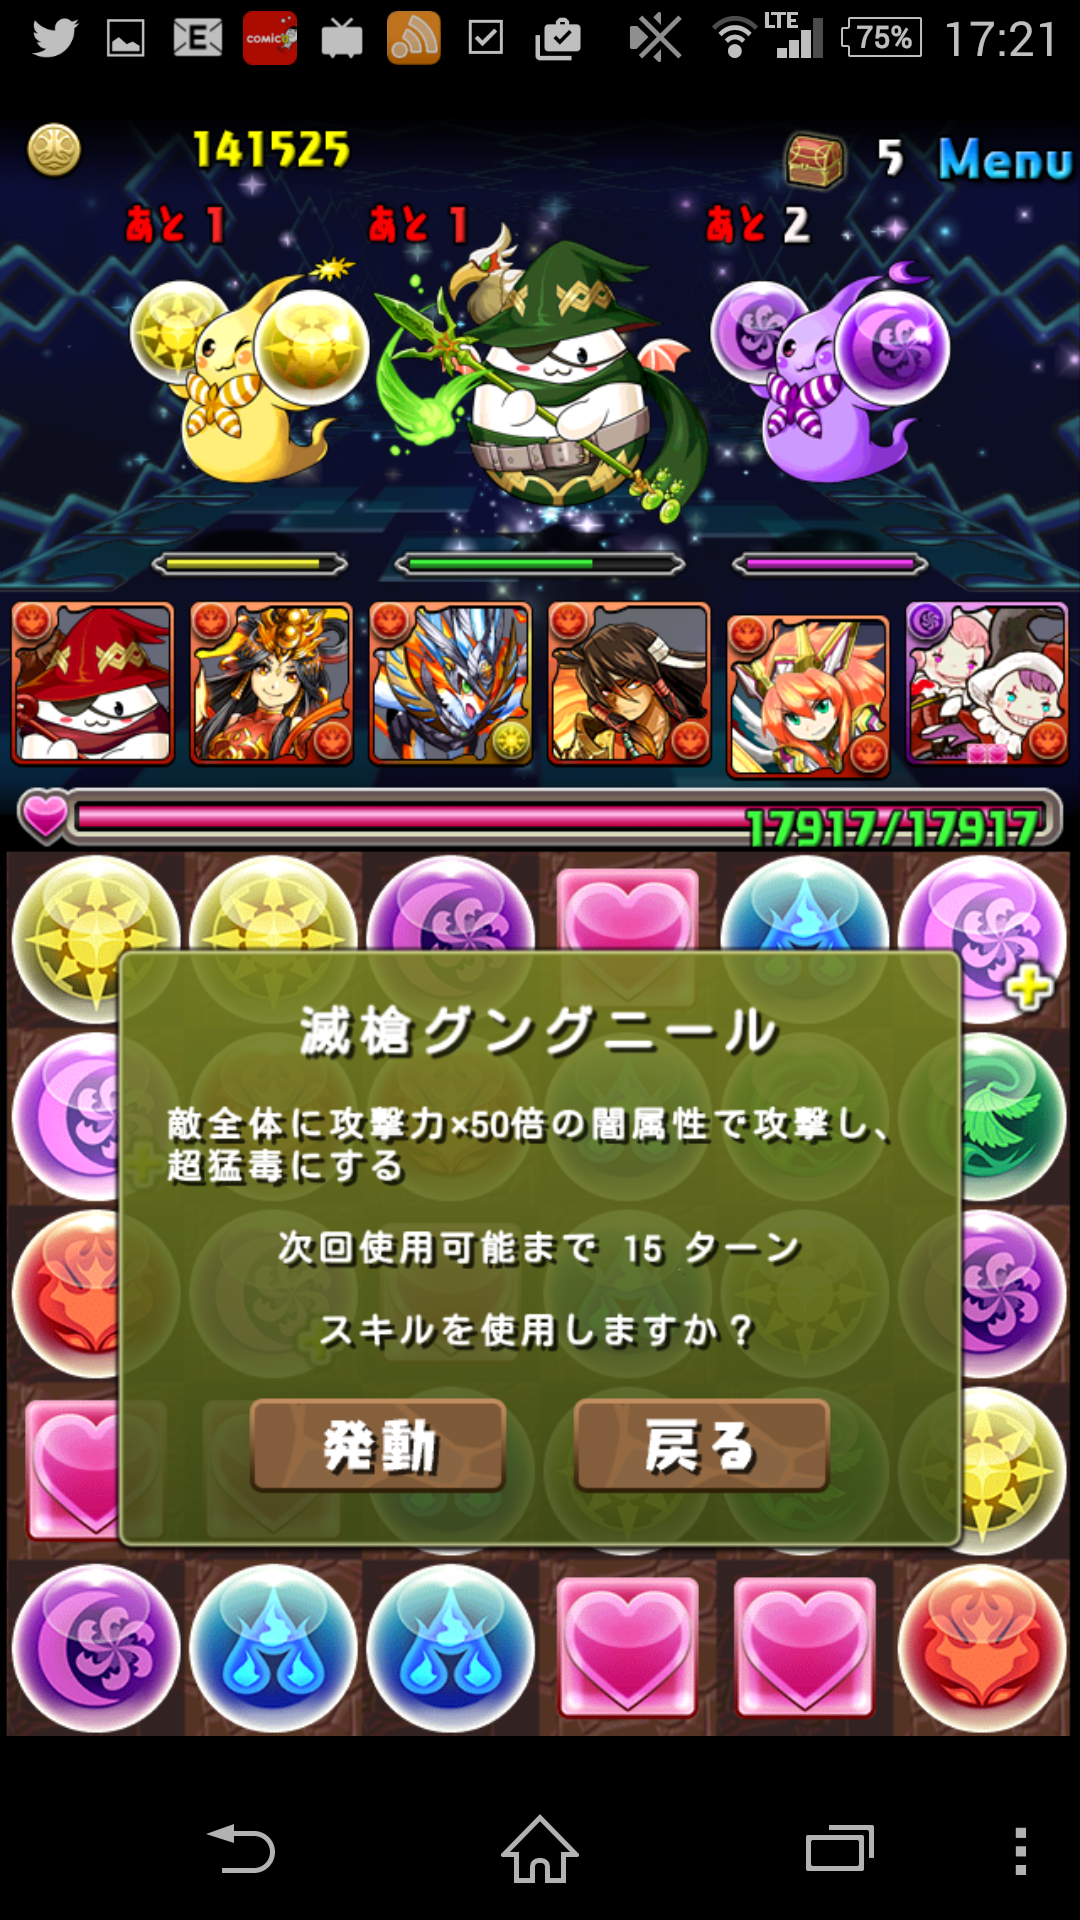 Screenshot_2015-03-21-17-21-57.png